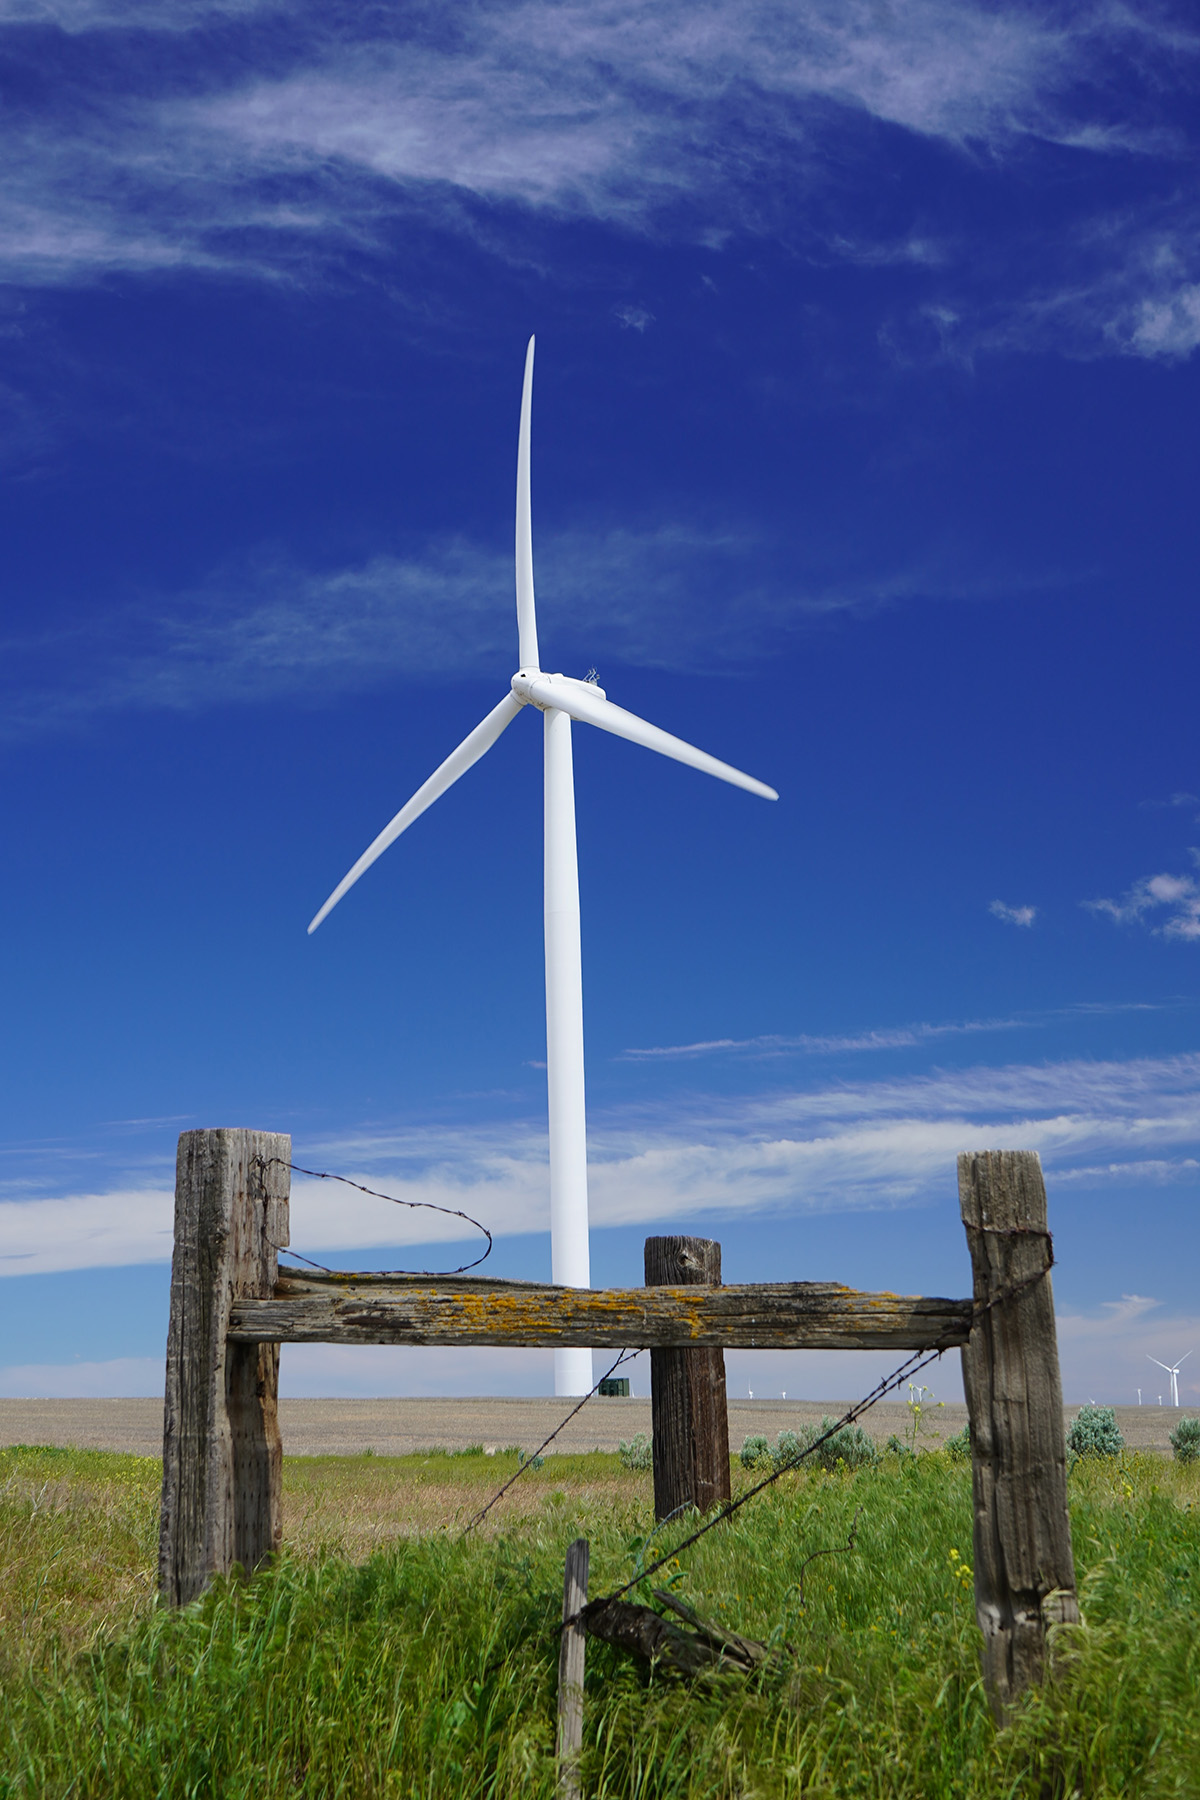 Wind turbine in a field